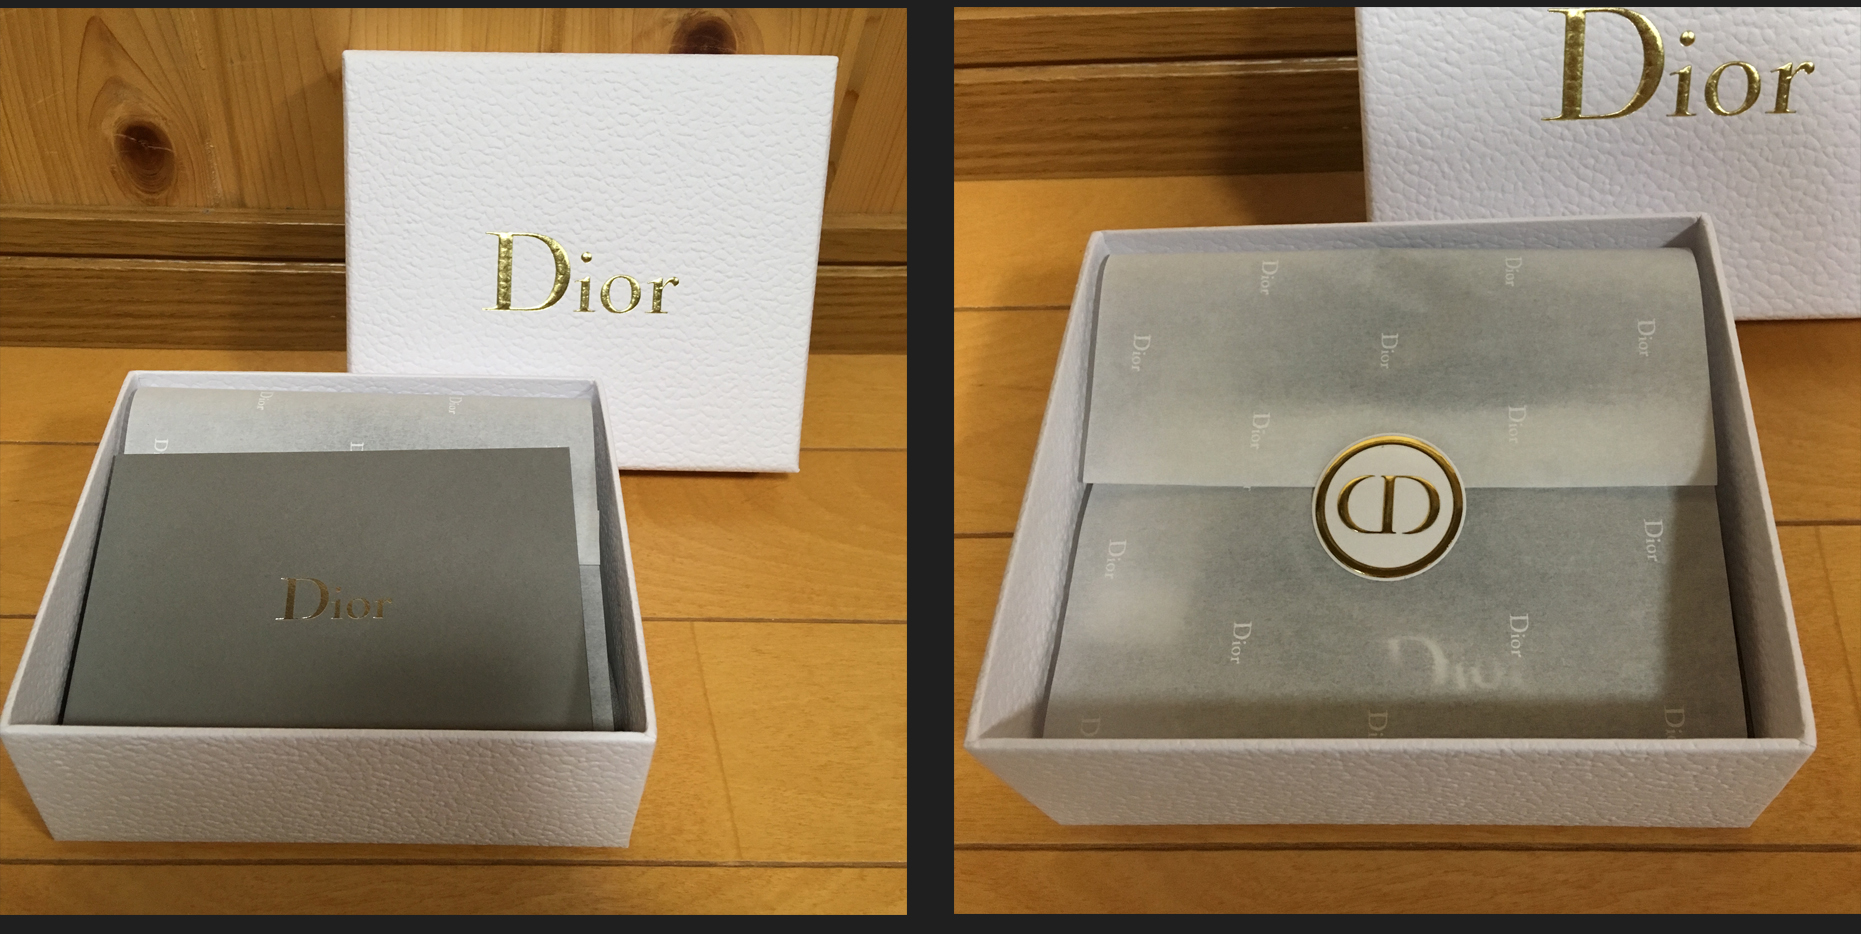 Dior ディオール オンラインブティック ギフトボックス ラッピング 梱包